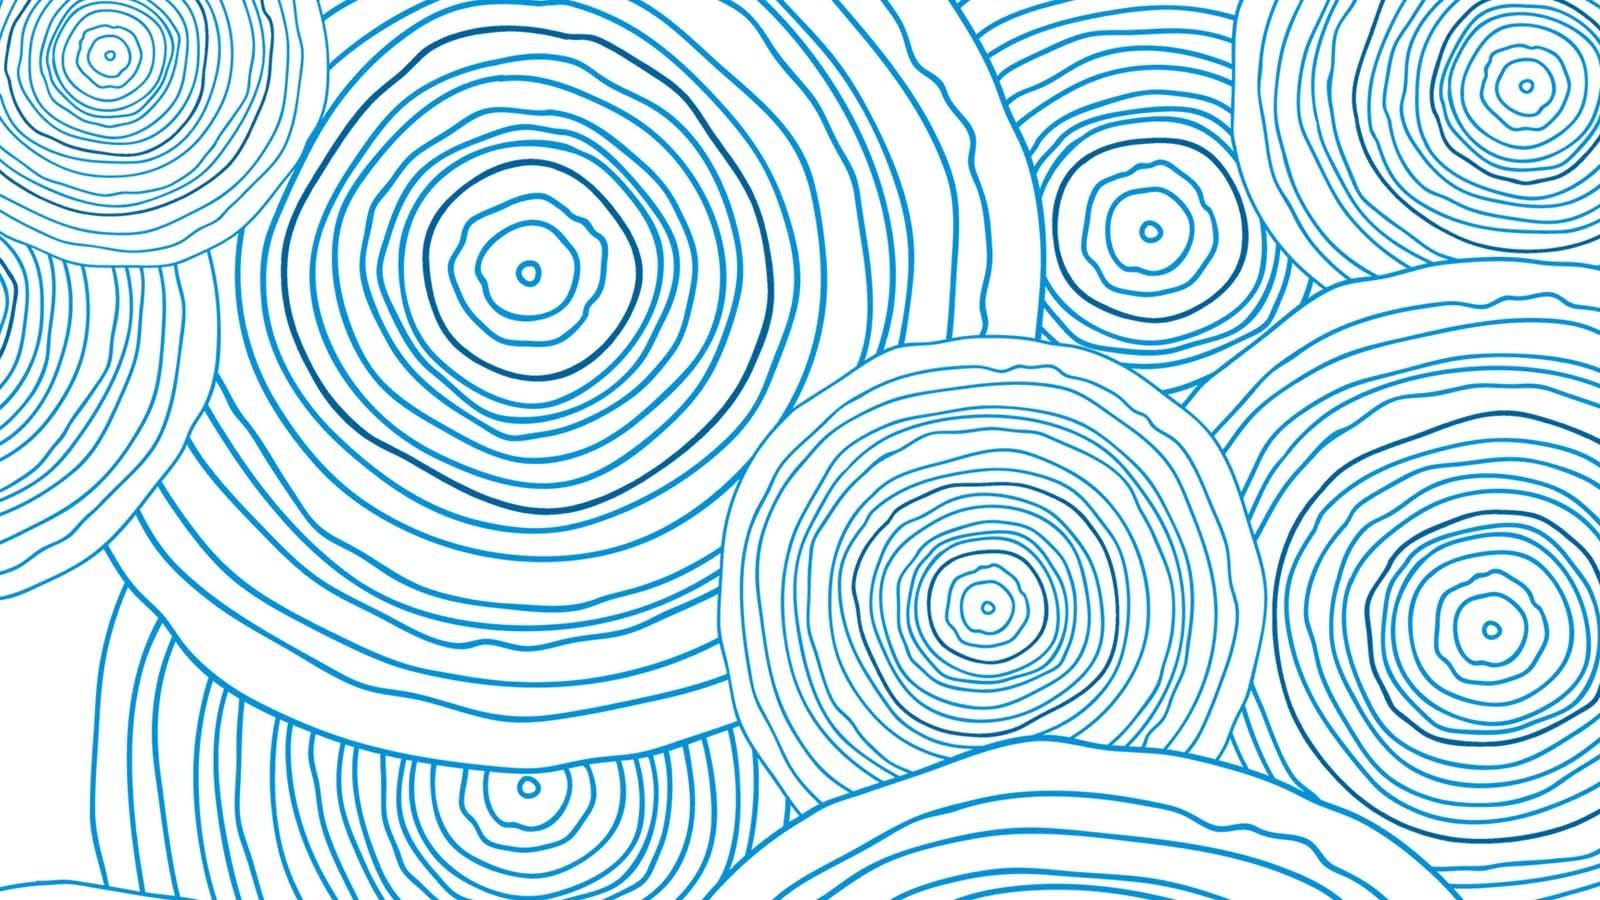 Artwork showing blue patterns of circles